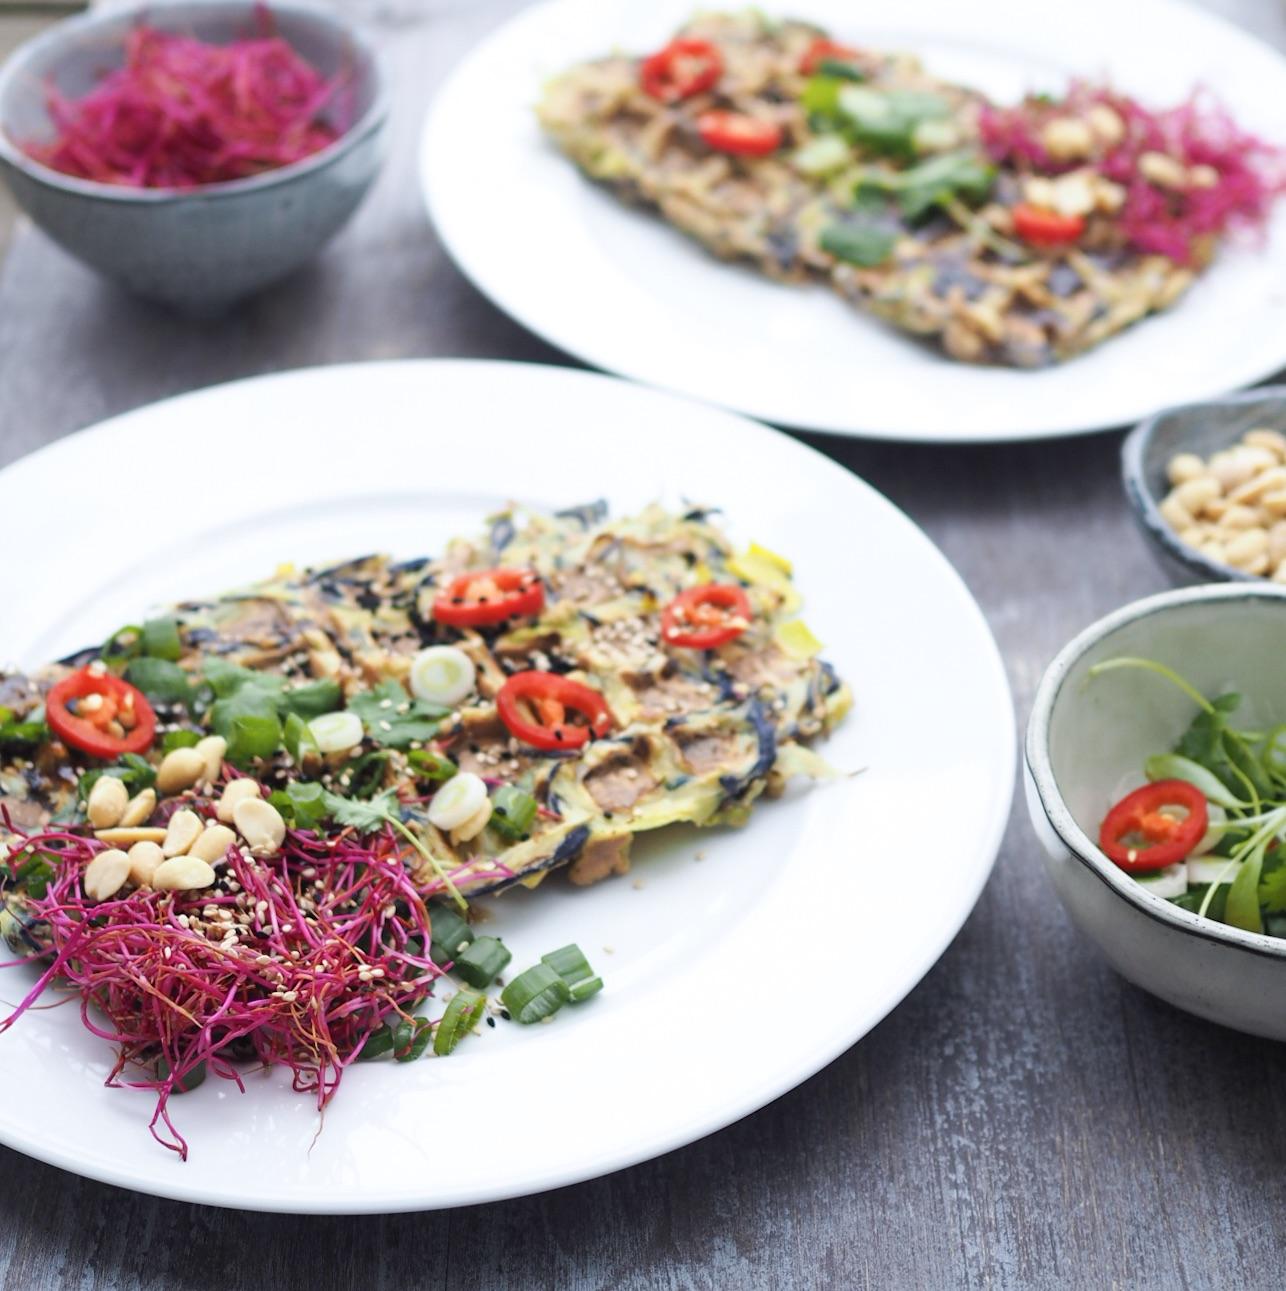 Opskrift på okonomiyaki - japansk pandekage, nu som vaffel